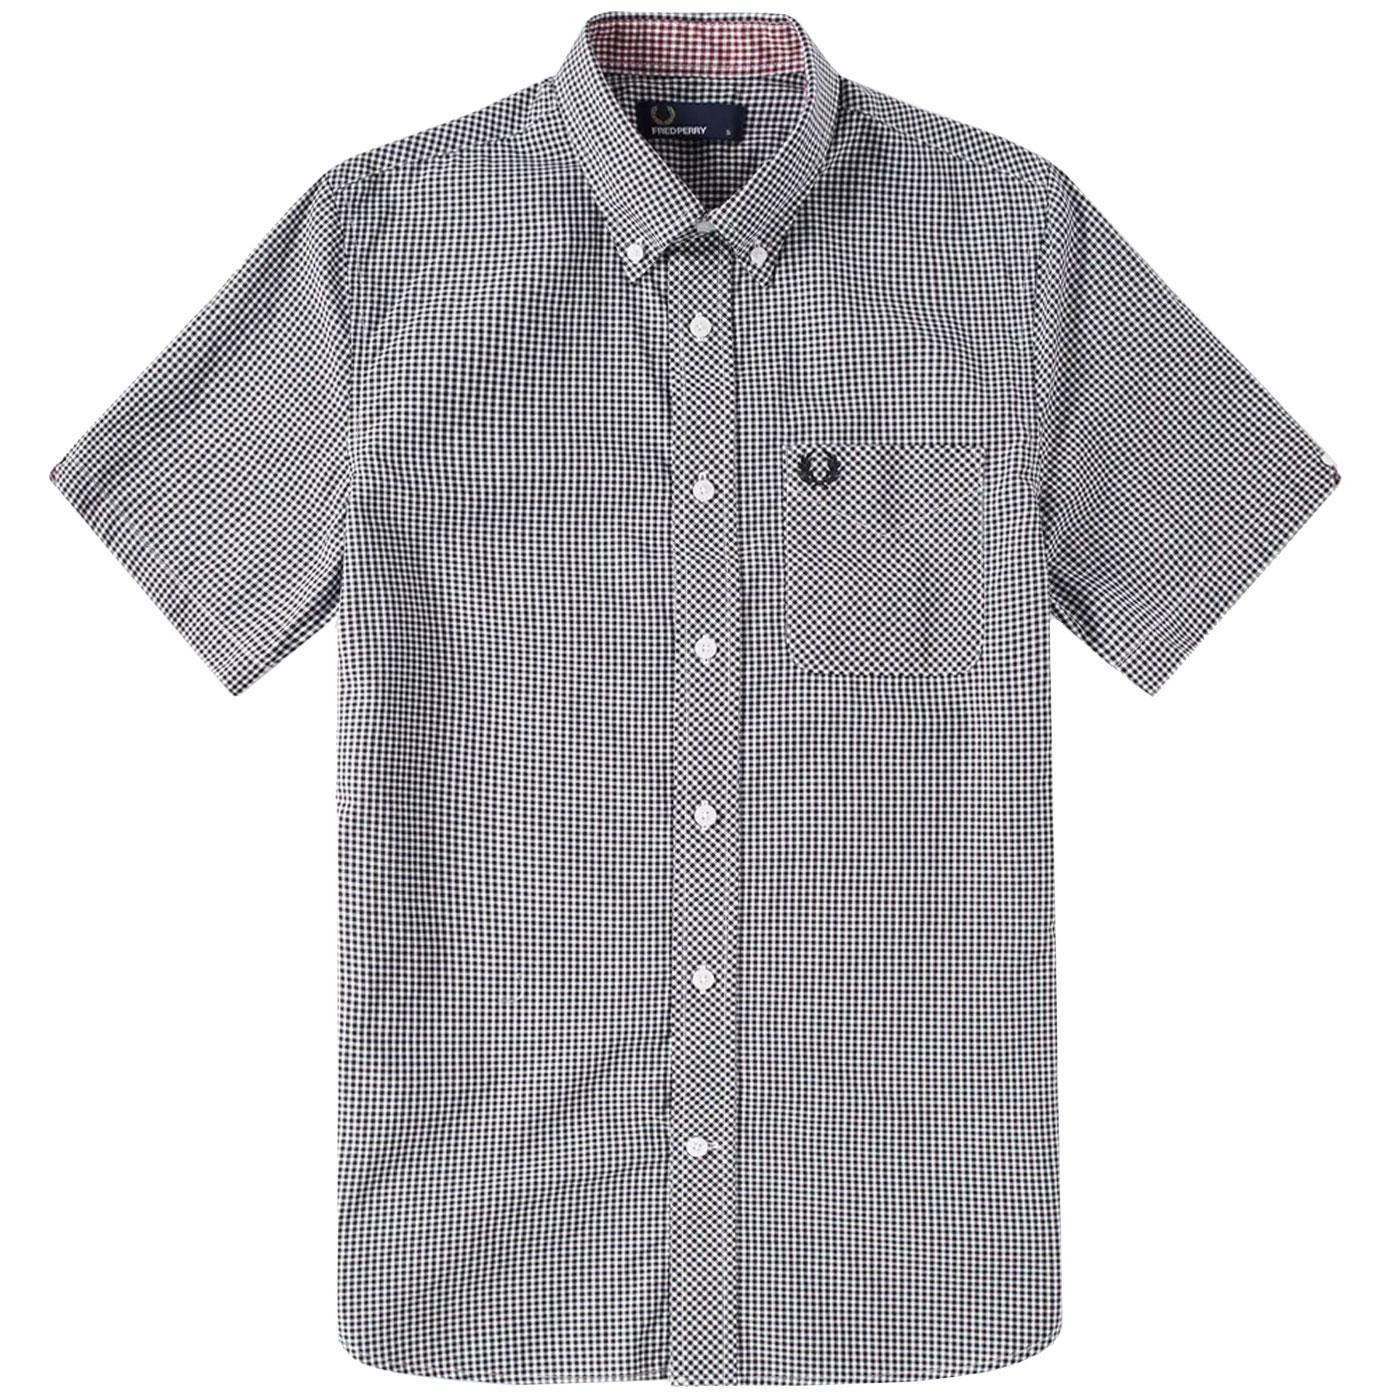 FRED PERRY Mens Retro Mod S/S Gingham Check Shirt